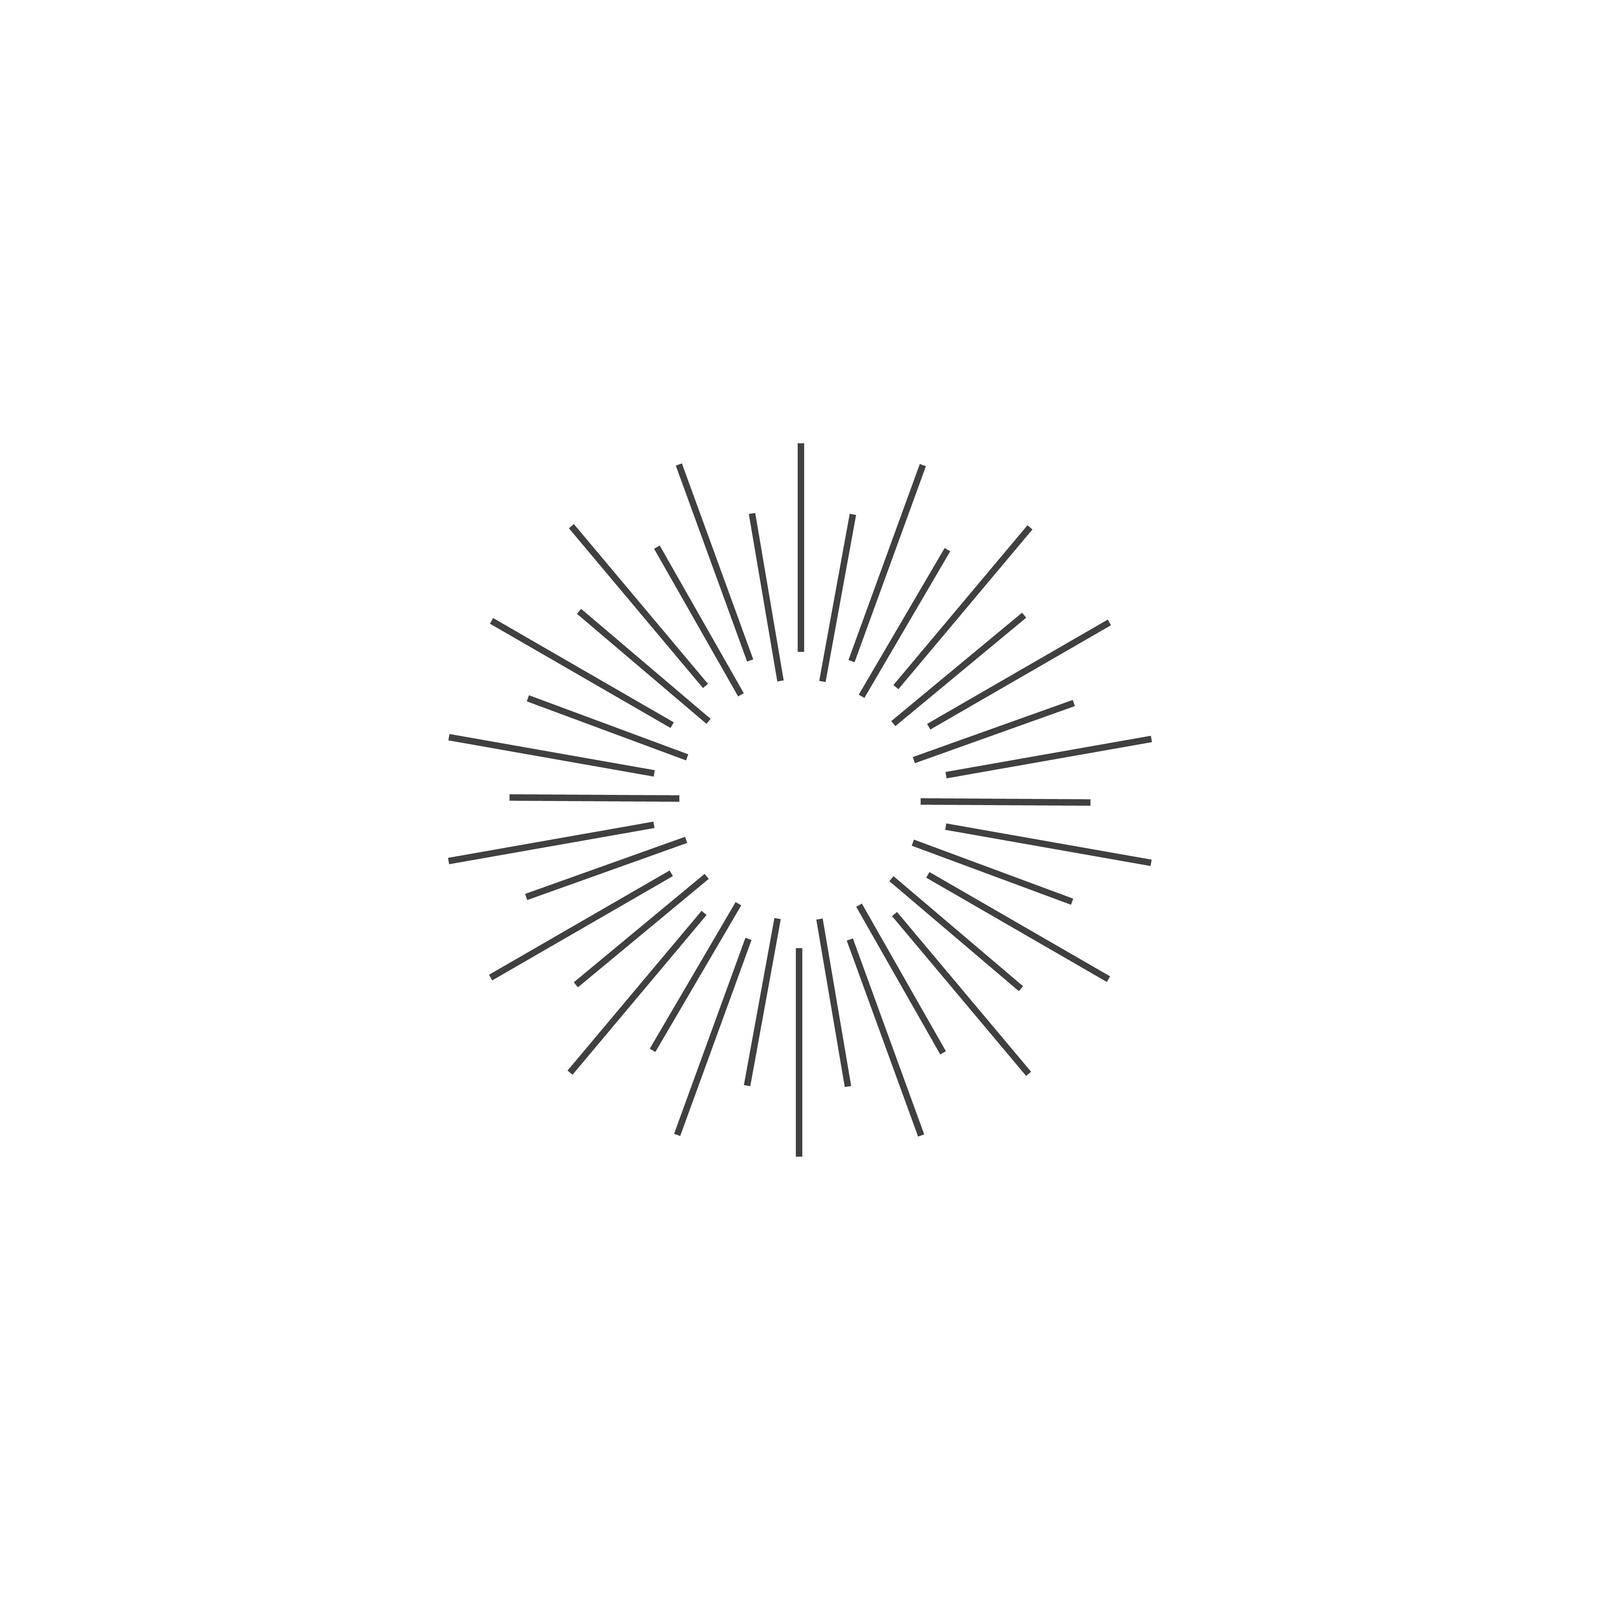 Sunburst icon vector flat design